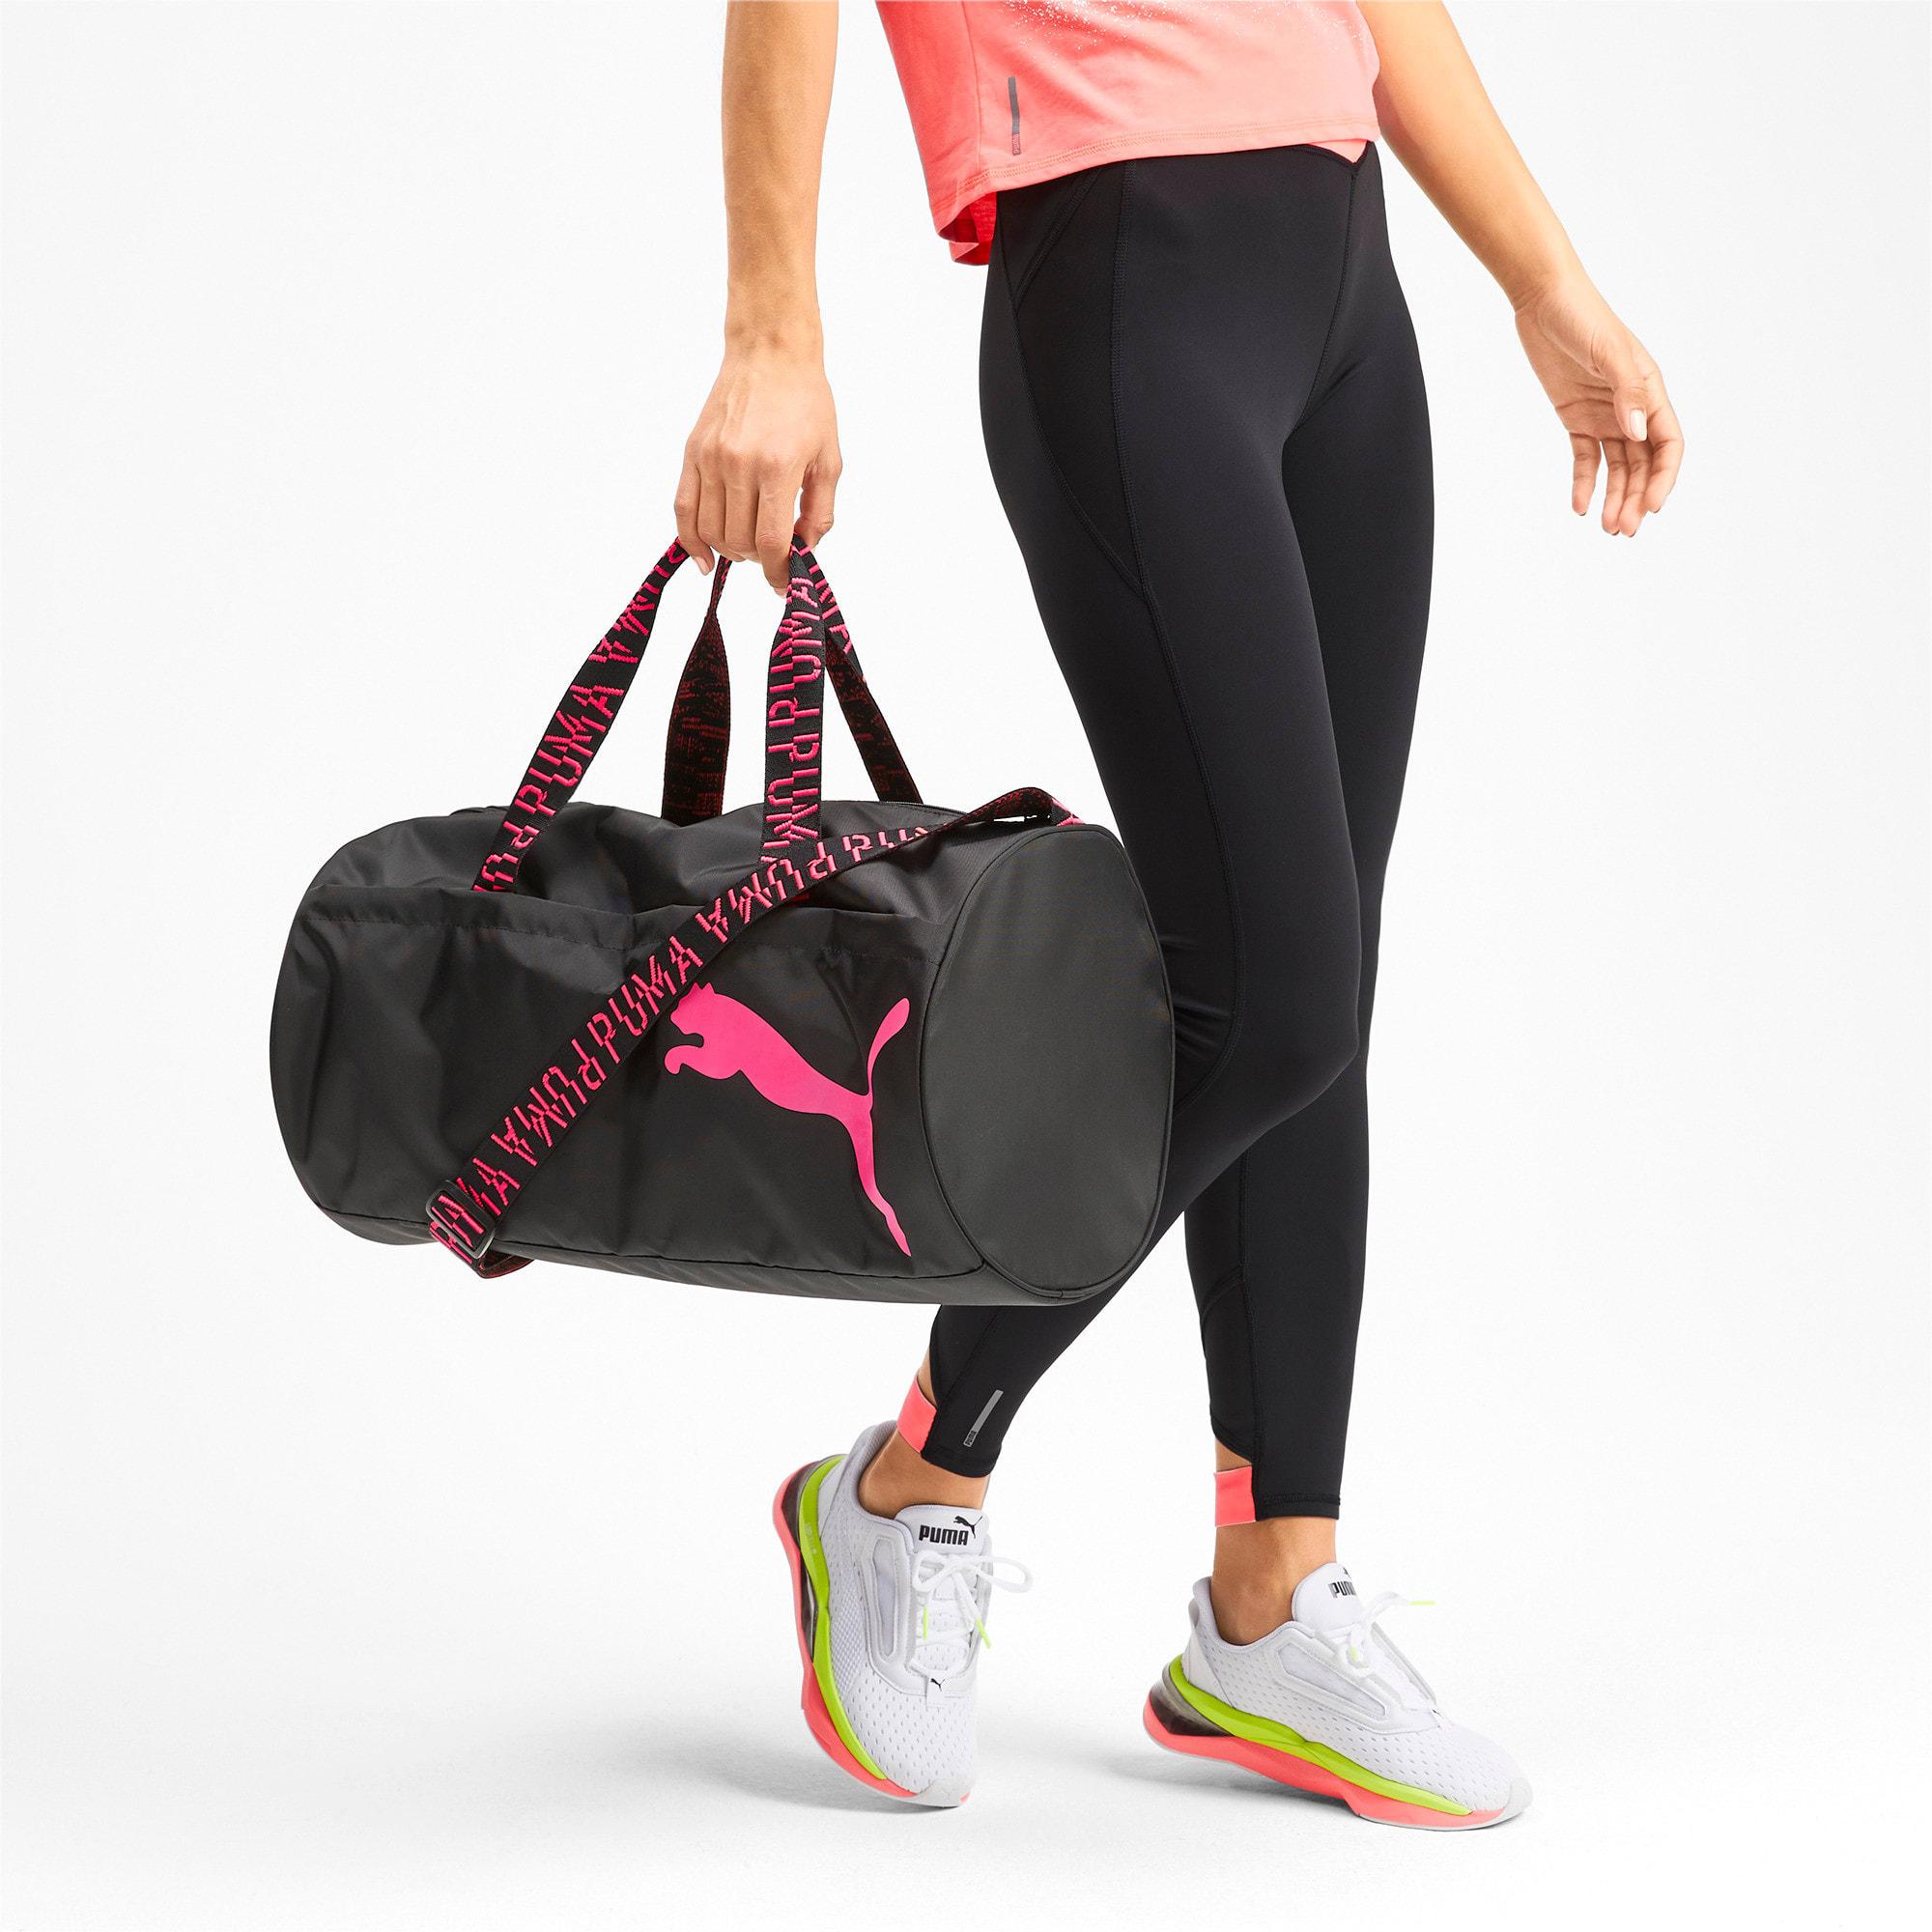 Thumbnail 2 of AT ESS Women's Training Duffel Bag, Puma Black-Pink Alert-AOP, medium